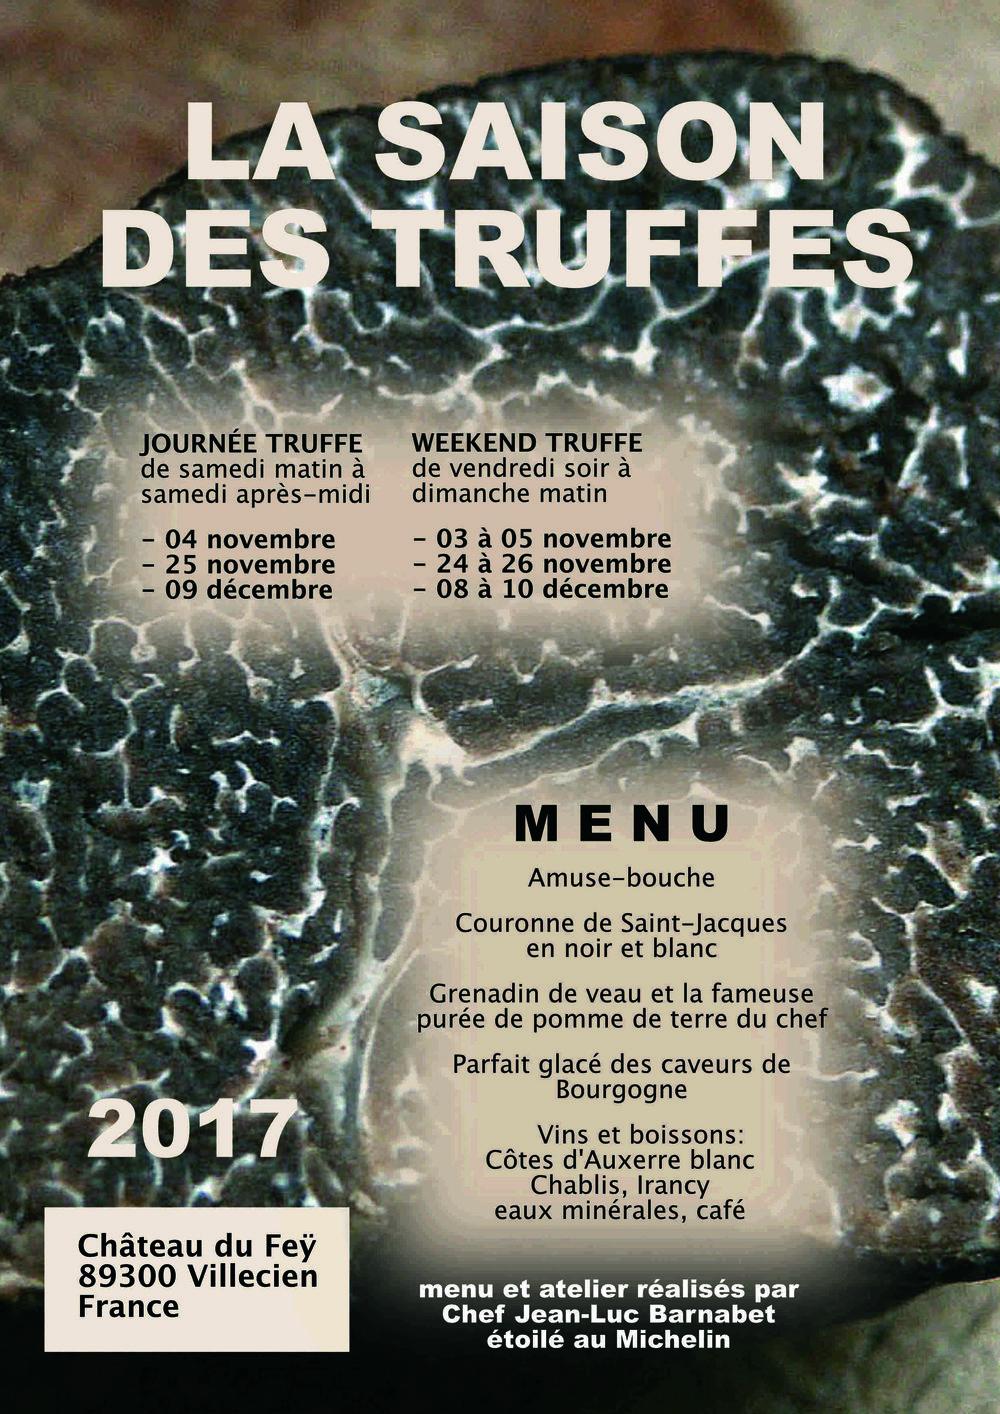 Decouverte truffe 01.jpg